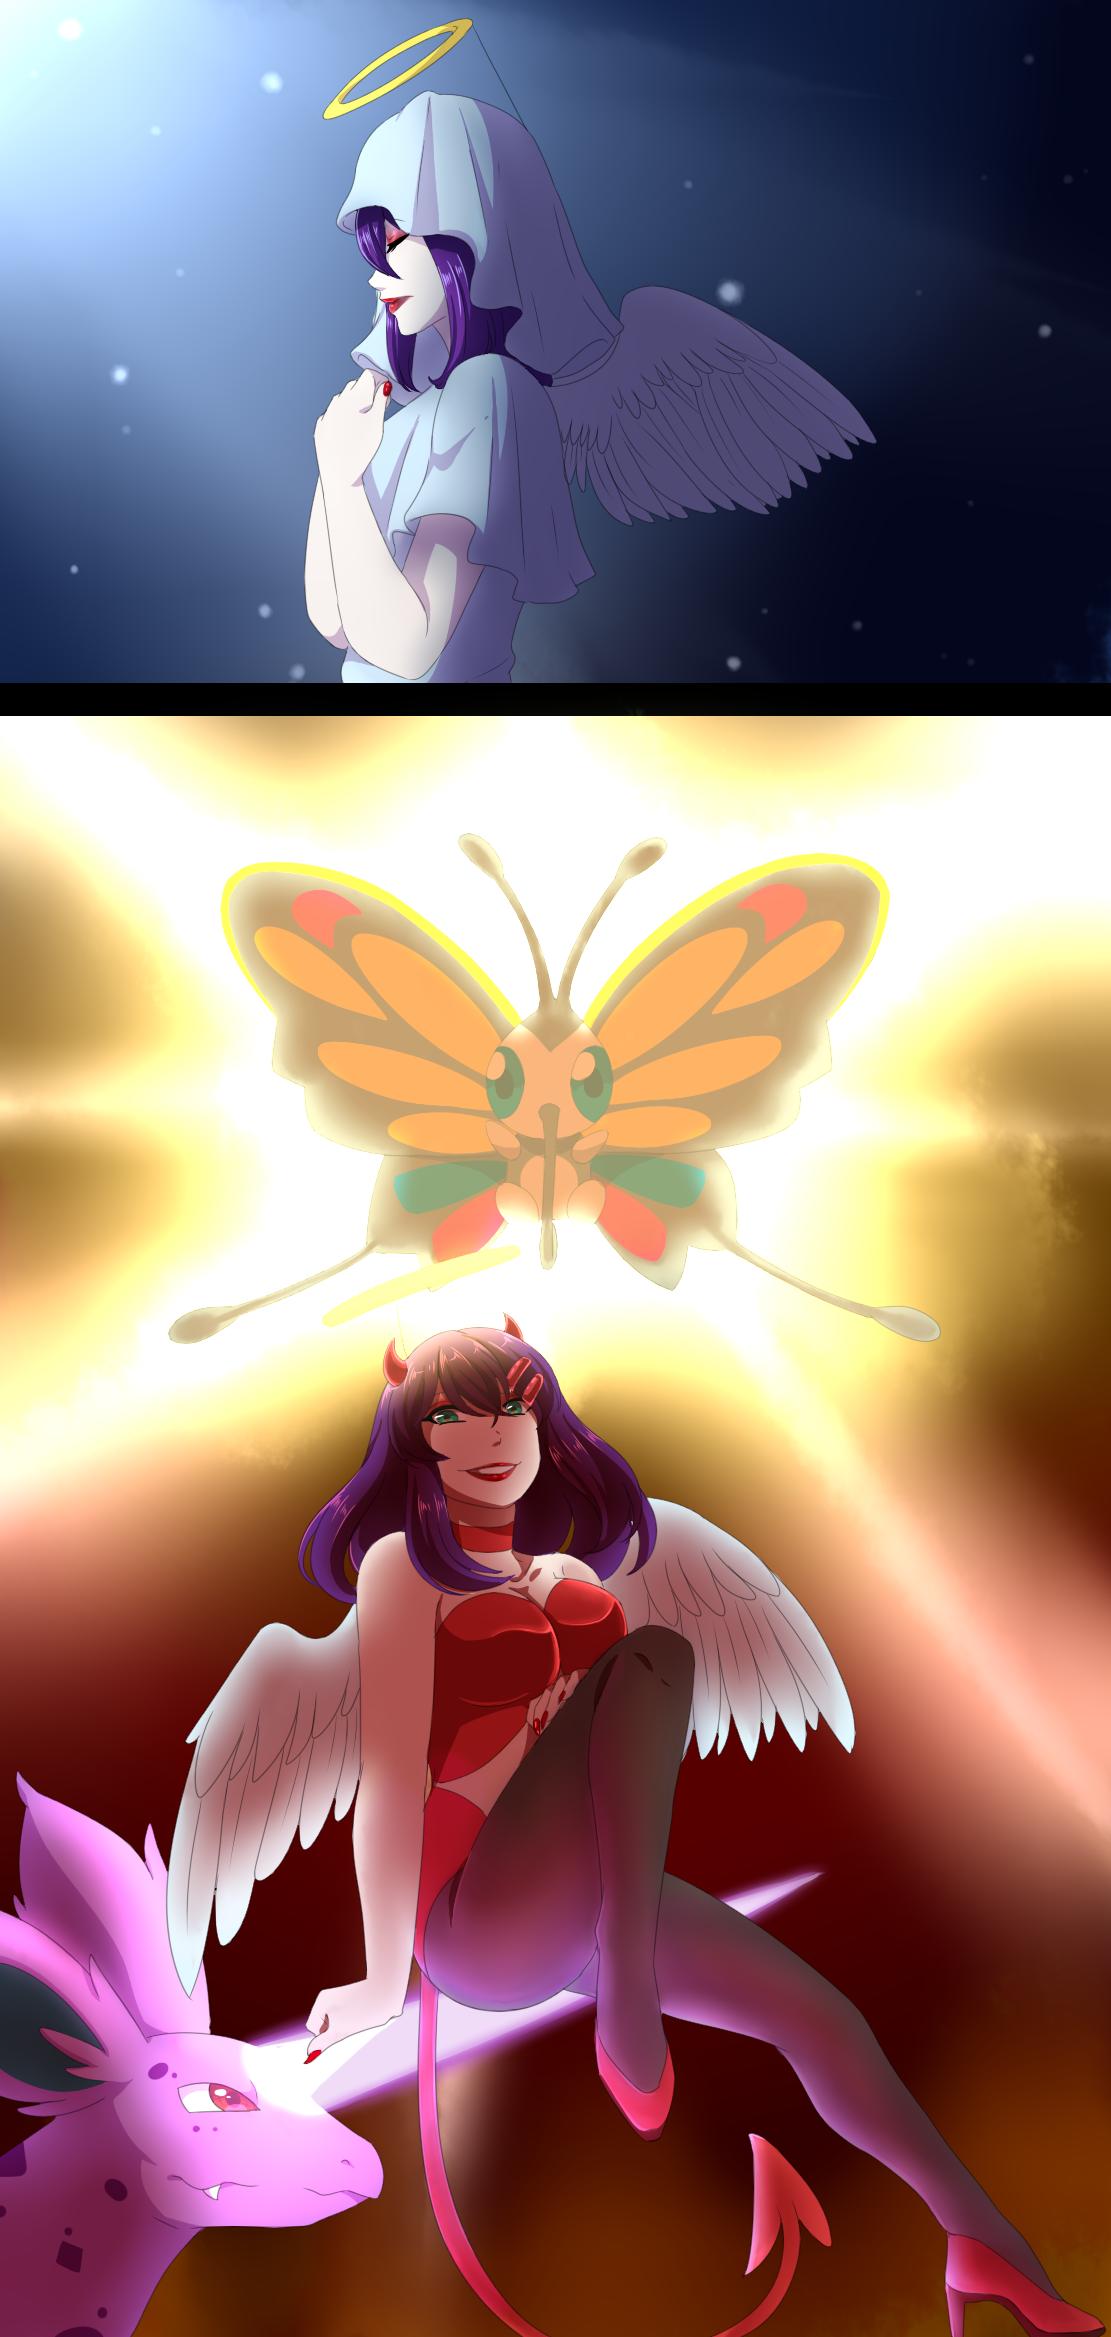 Aureolas Gigantes aa2] - angel contest - angel of the stagekoyukistyle on